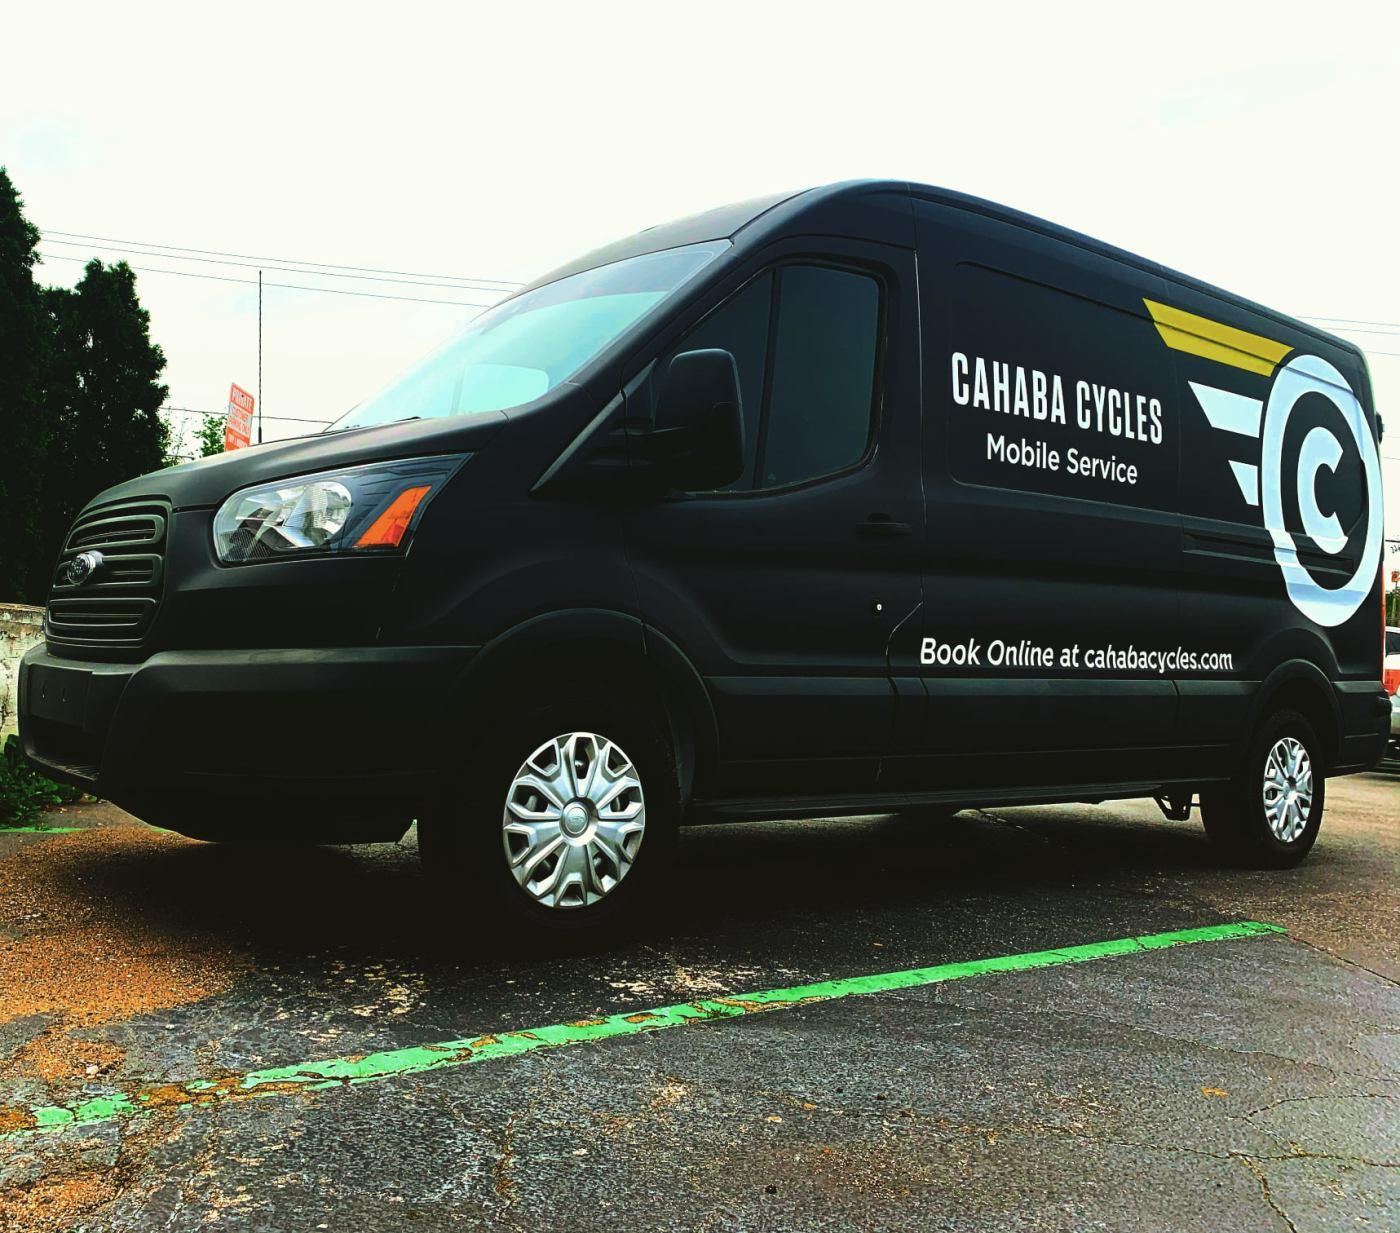 Cahaba Cycles truck